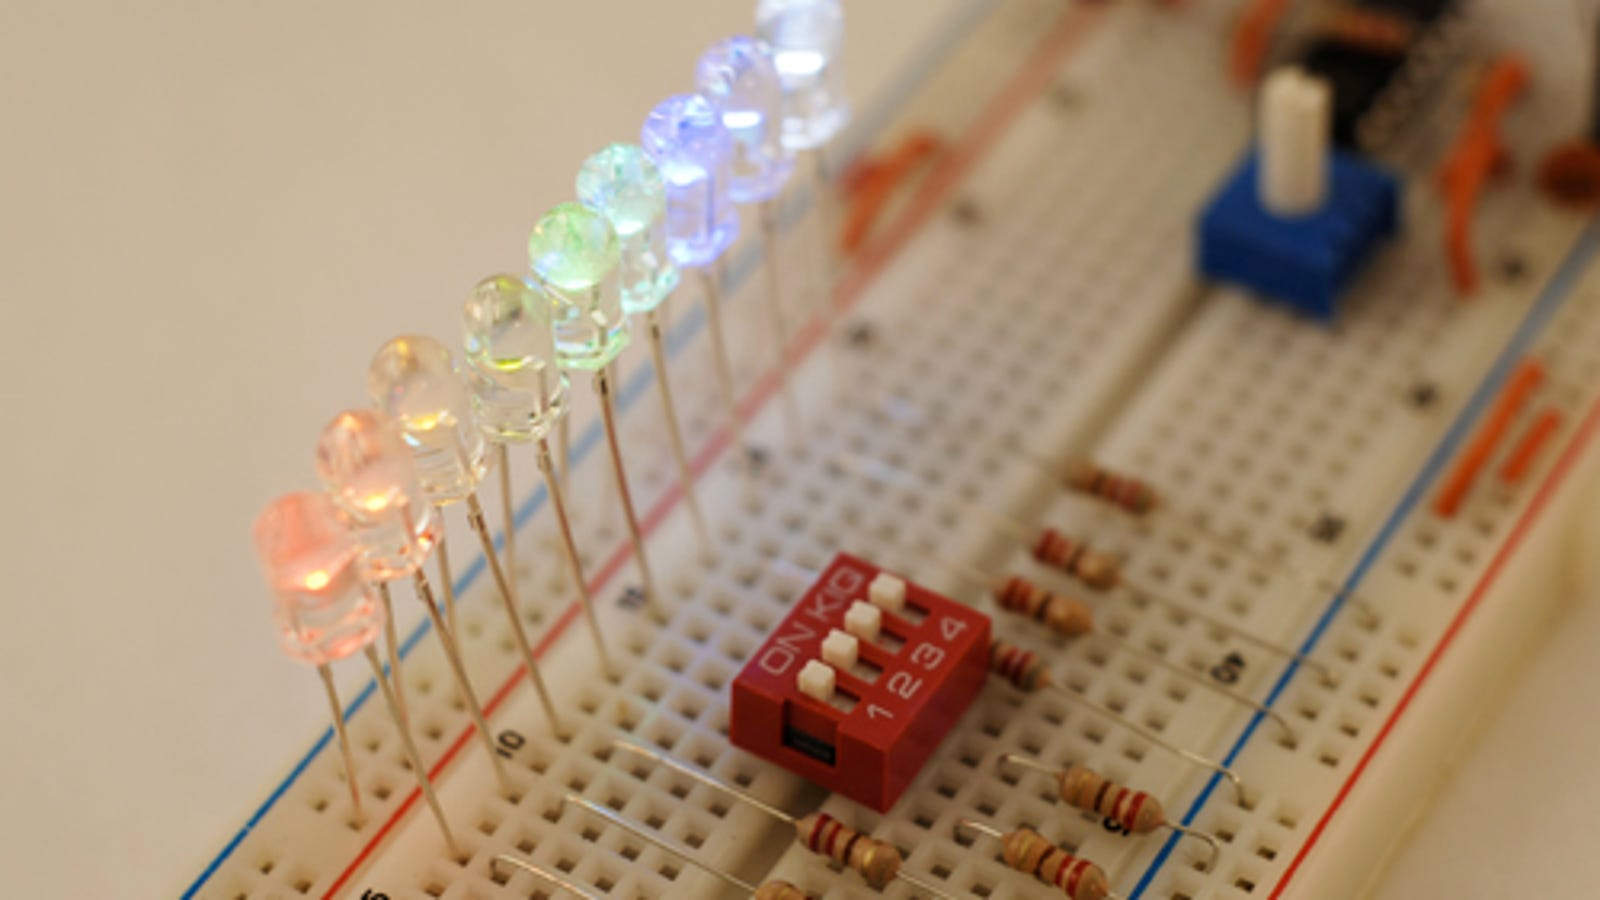 Gizmodo University: The Bright Ideas Behind LED's